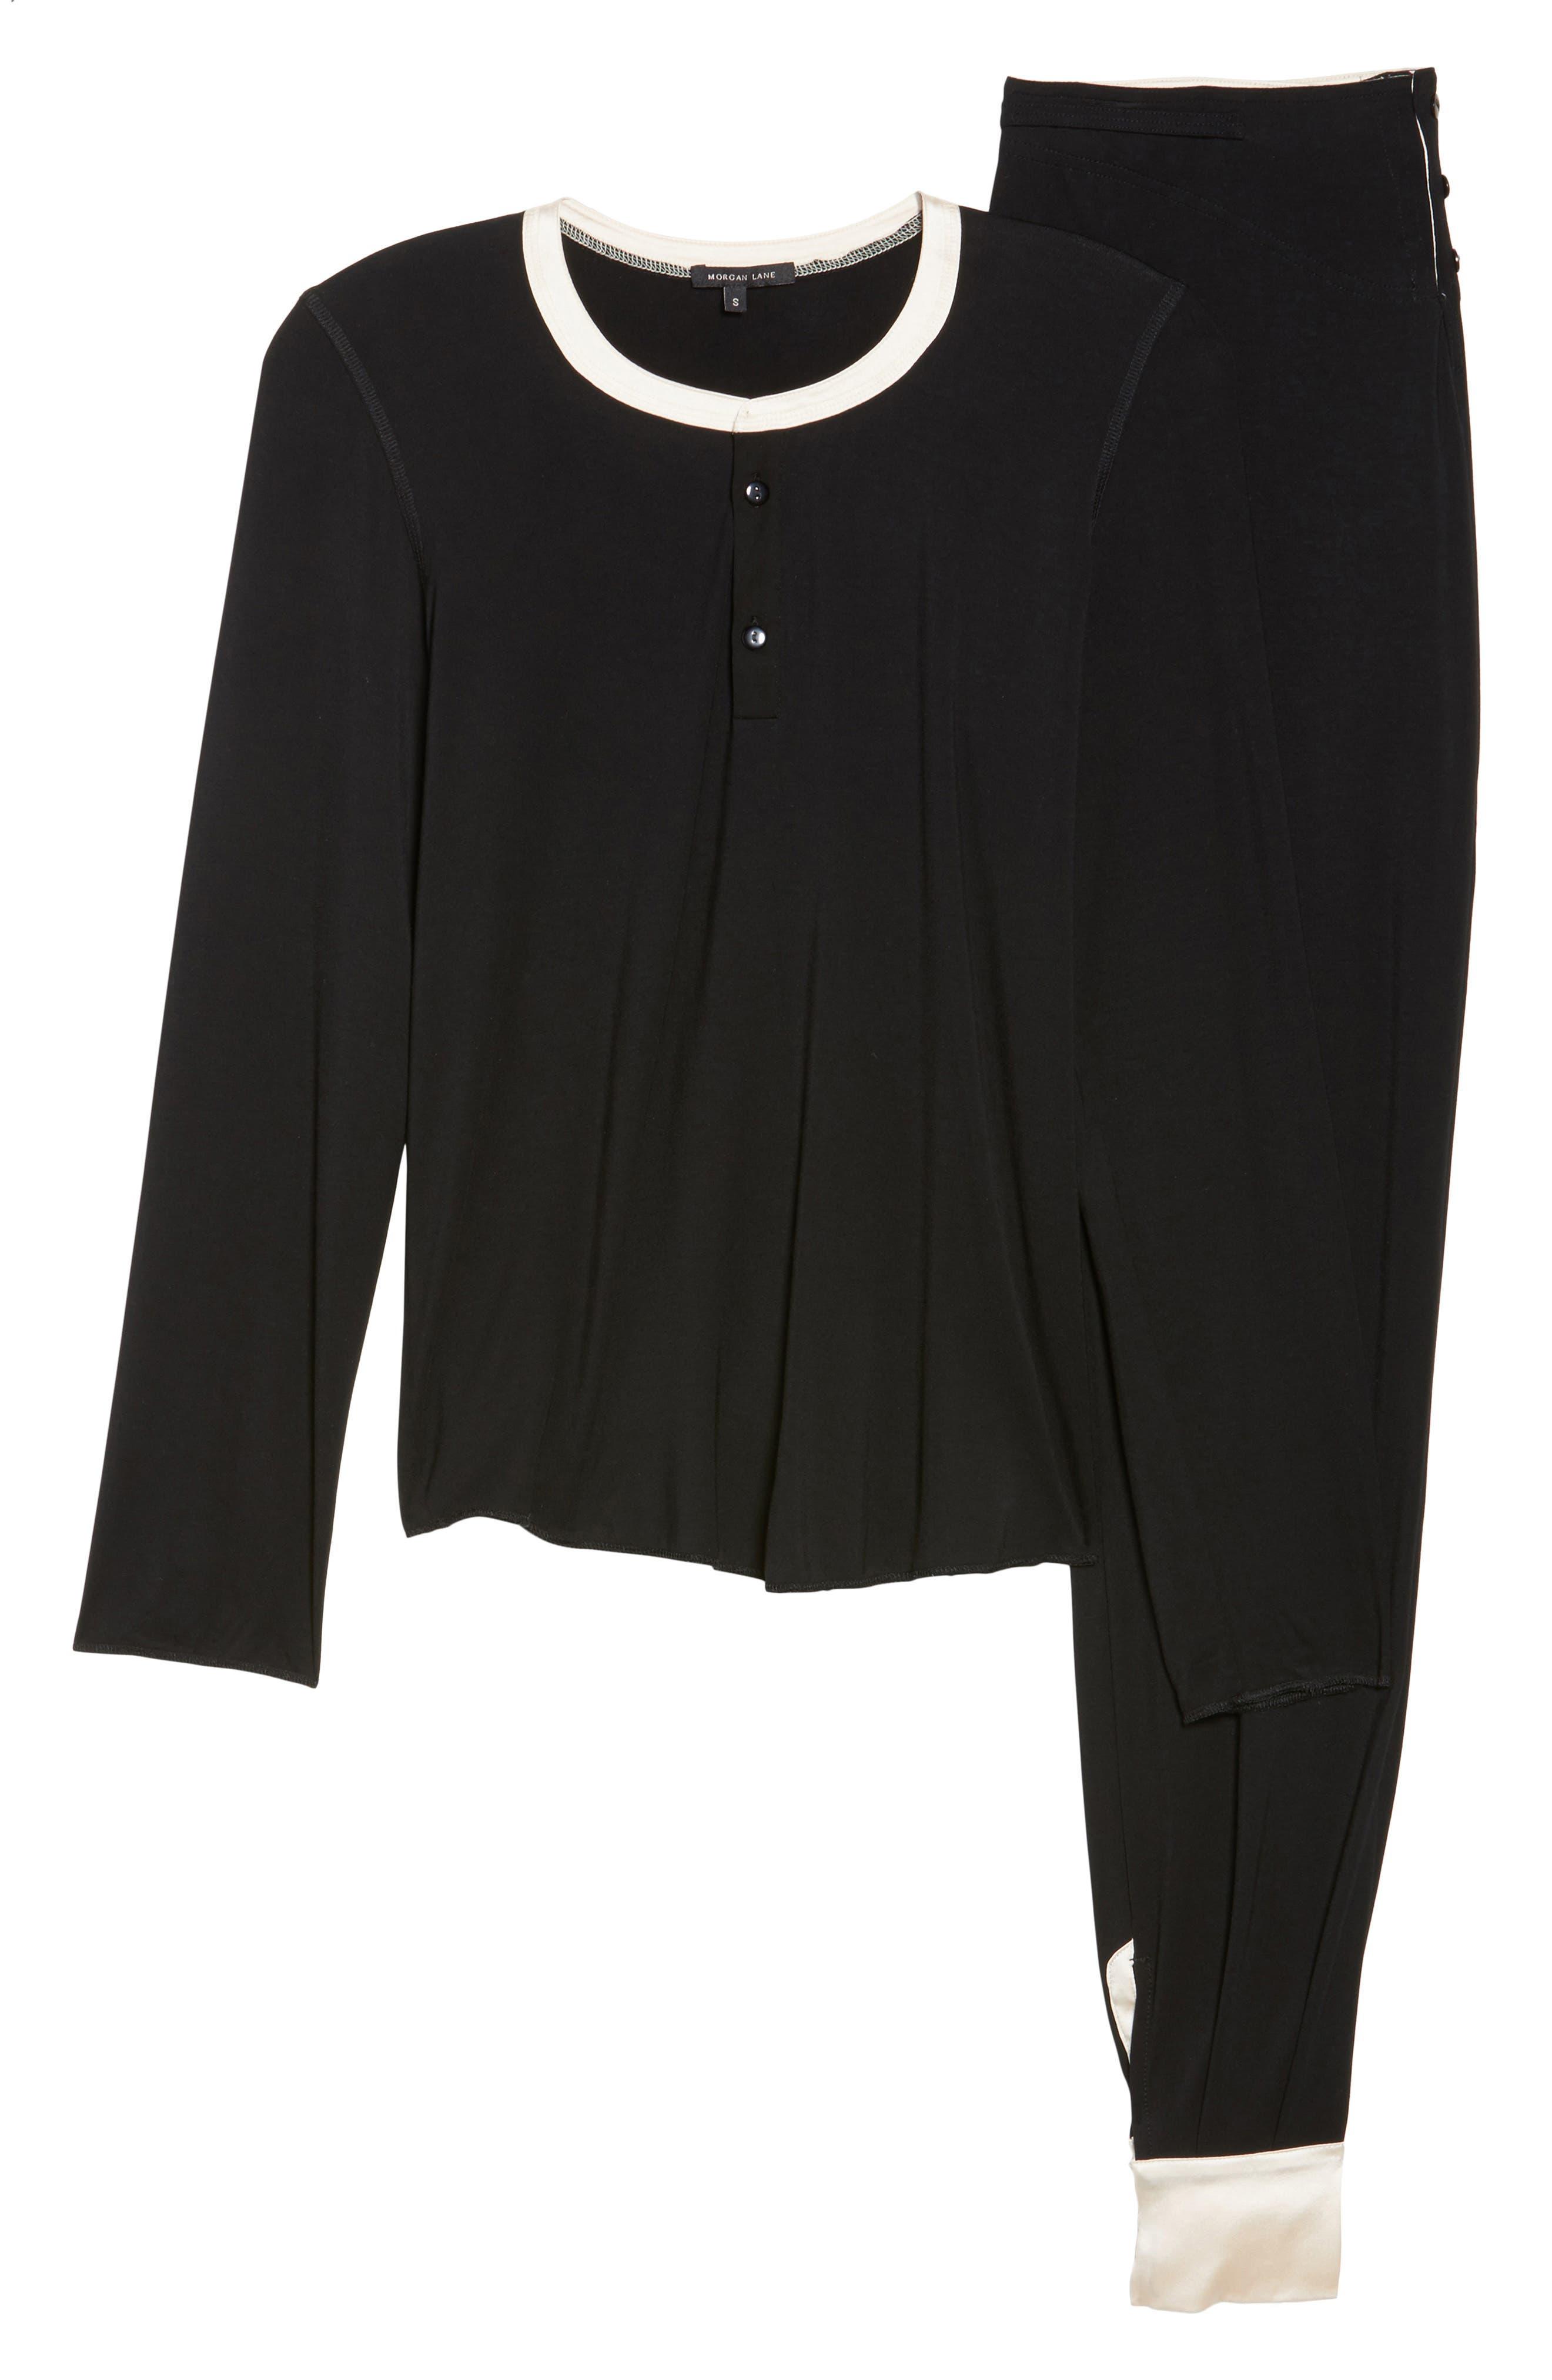 Cara Modal Knit Long Pajamas,                             Alternate thumbnail 4, color,                             Noir/ Vanilla